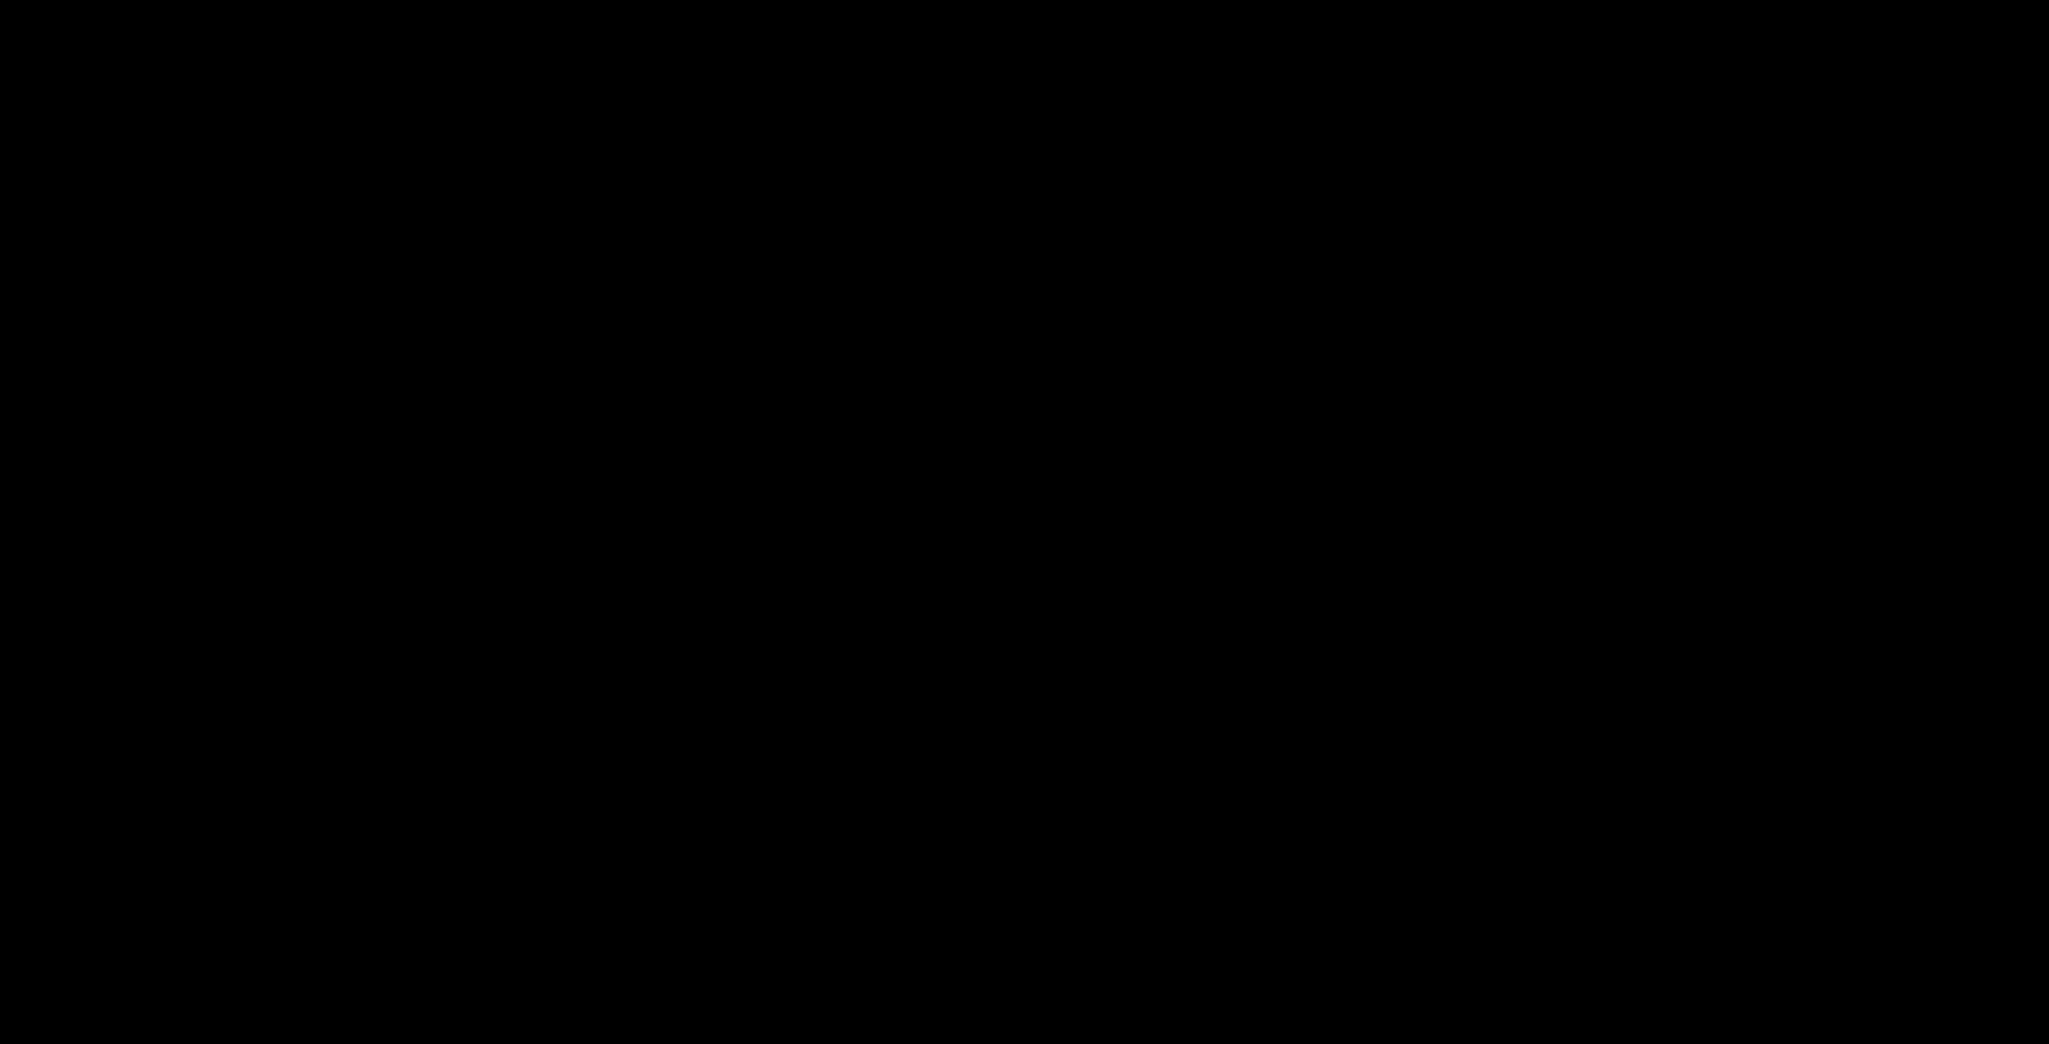 simmons beautyrest logo png logos png68 simmons